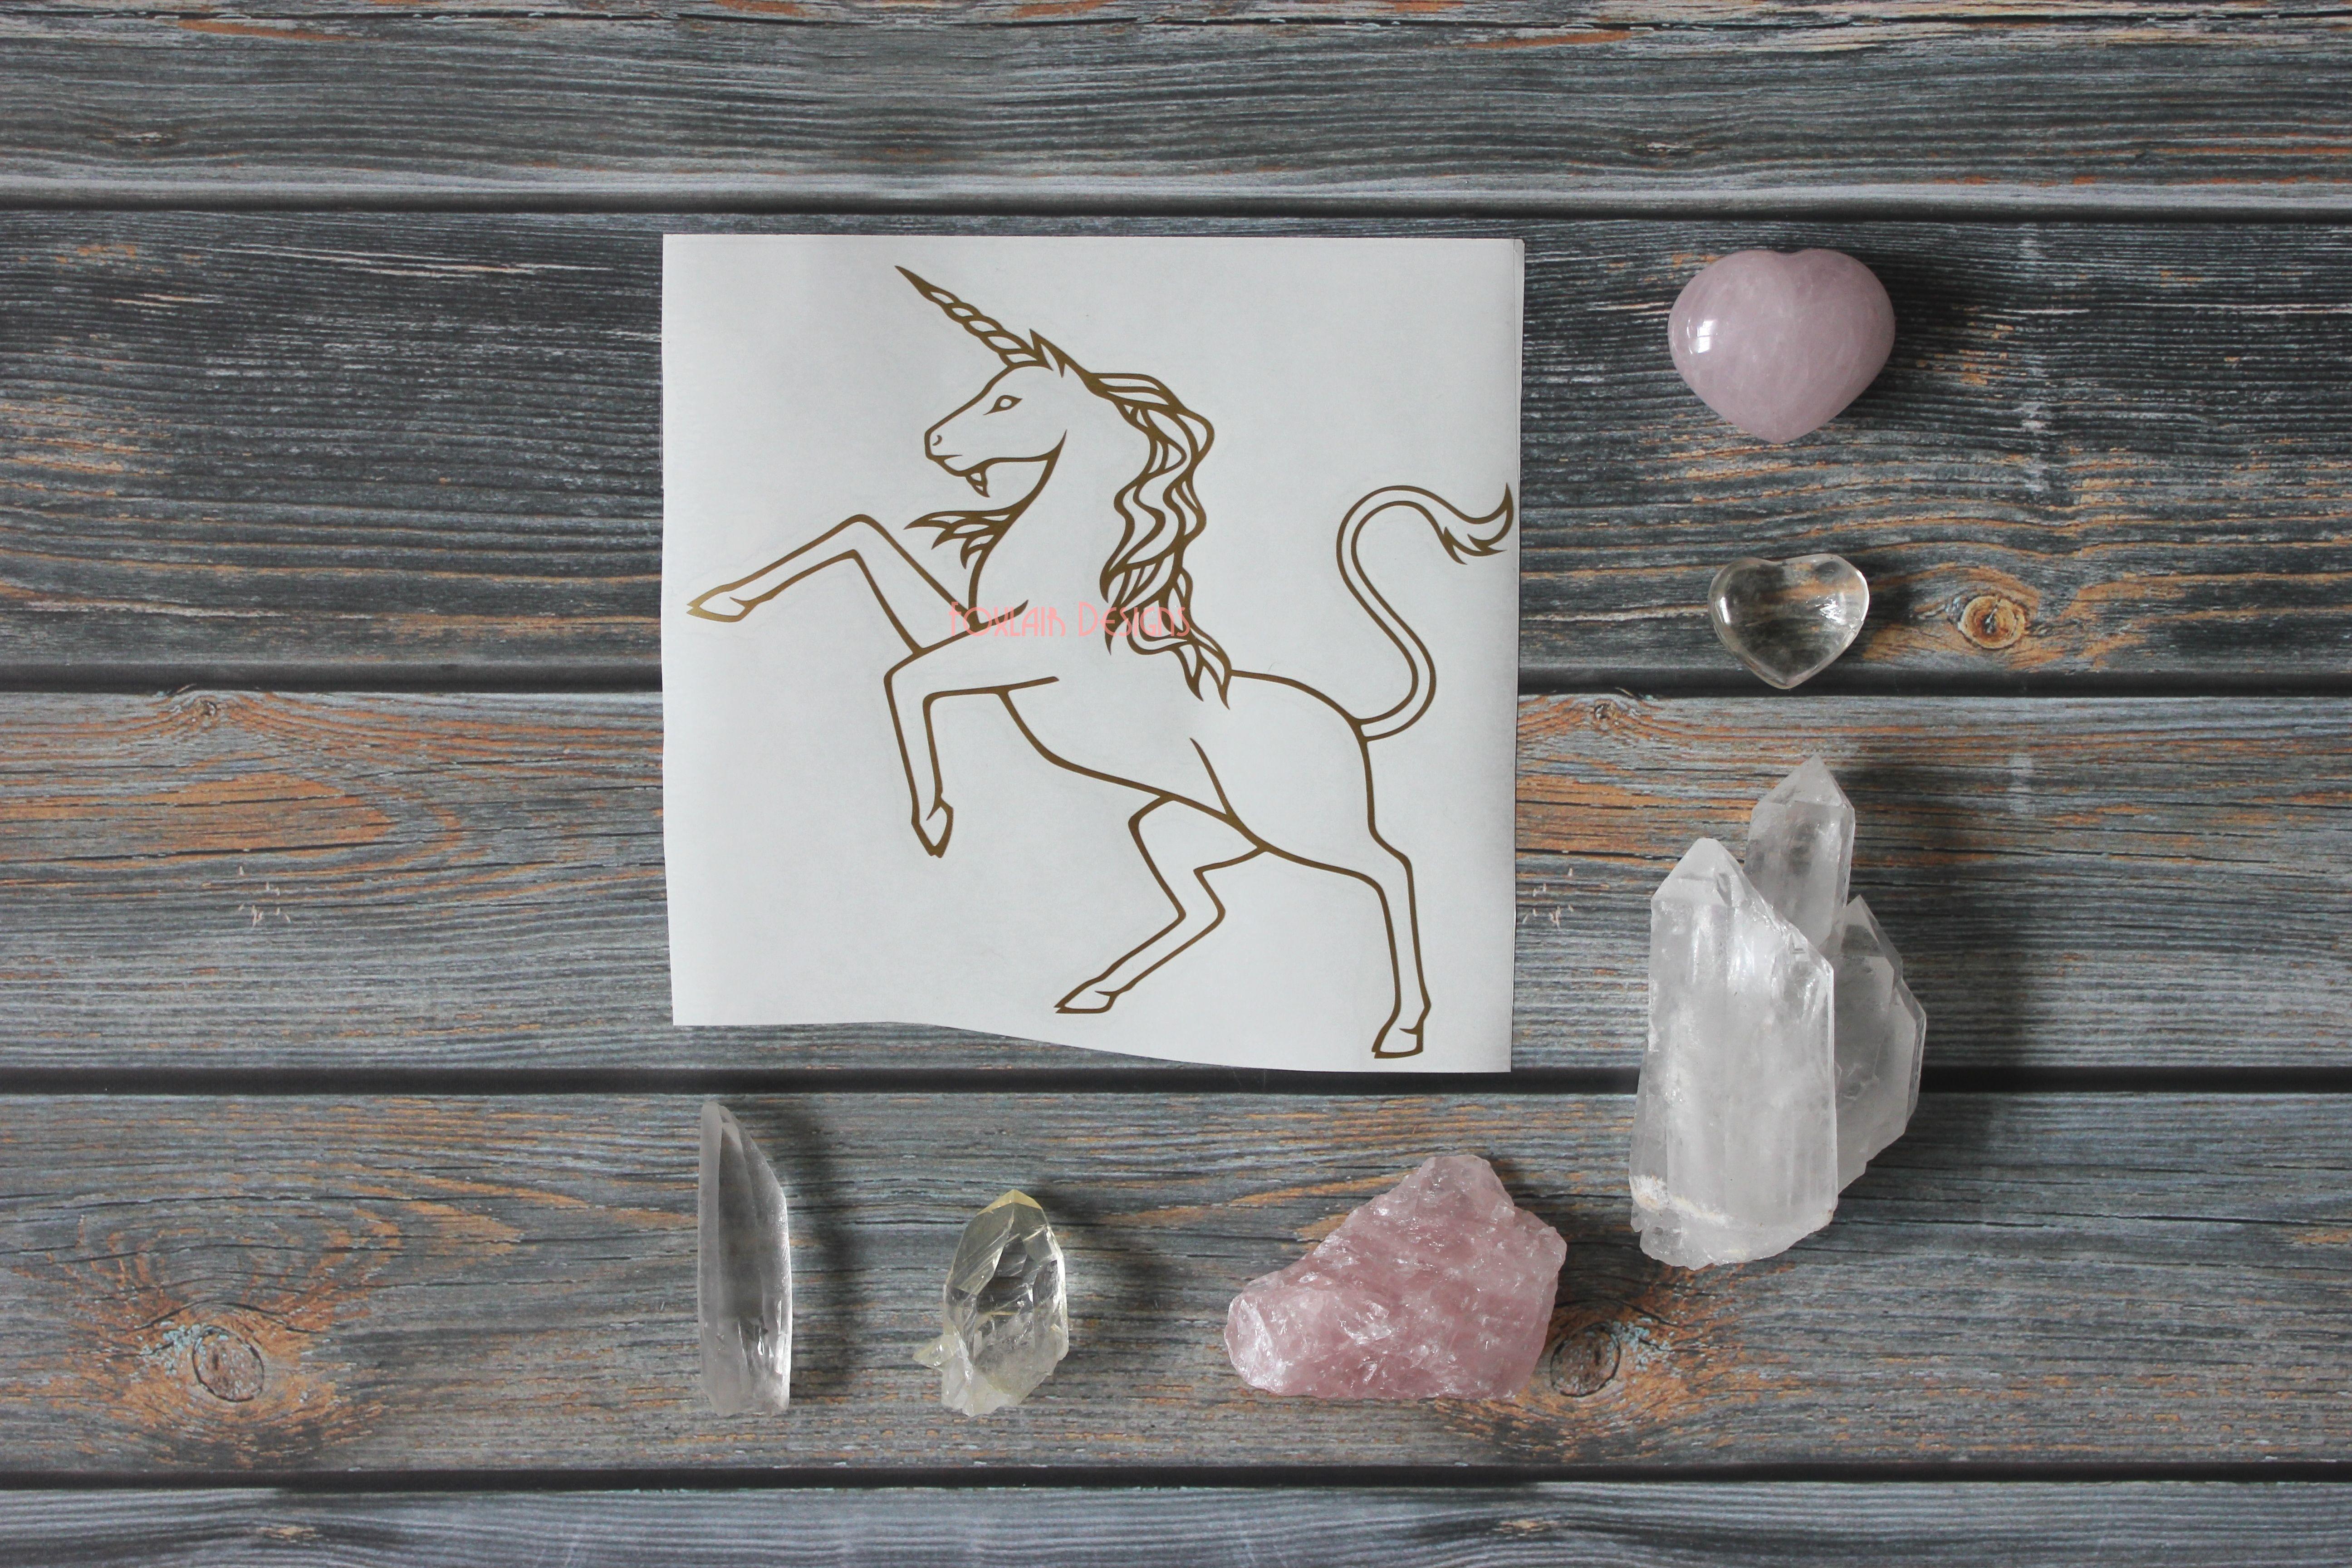 Unicorn Vinyl Decal Bumper Sticker Scottish Scotland Etsy Vinyl Decals Bumper Stickers Mythical Creatures Fantasy [ 3456 x 5184 Pixel ]